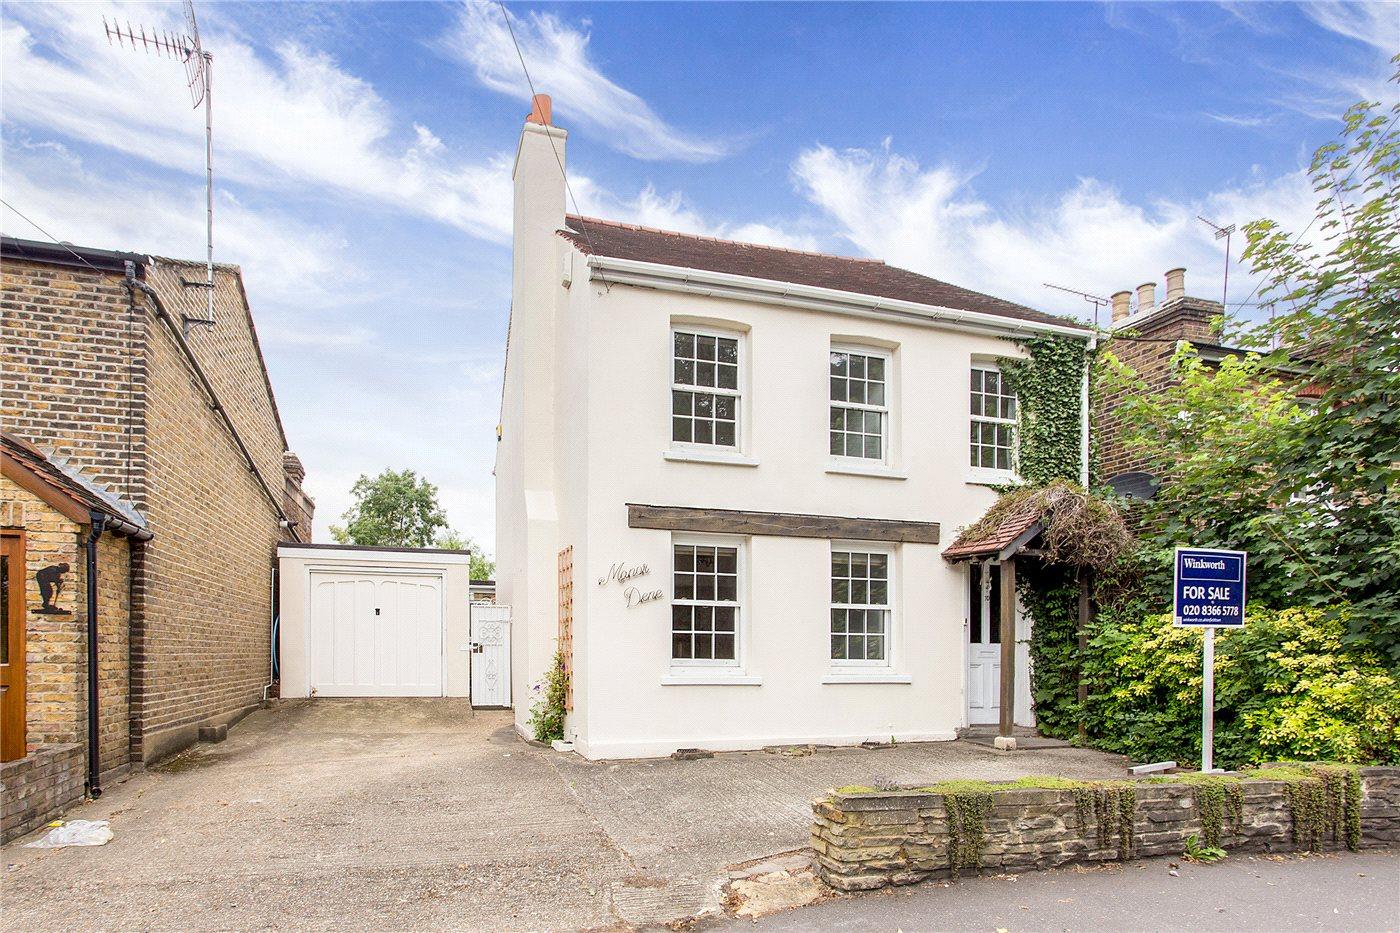 4 Bedrooms Detached House for sale in Bulls Cross, Enfield, Middlesex, EN2